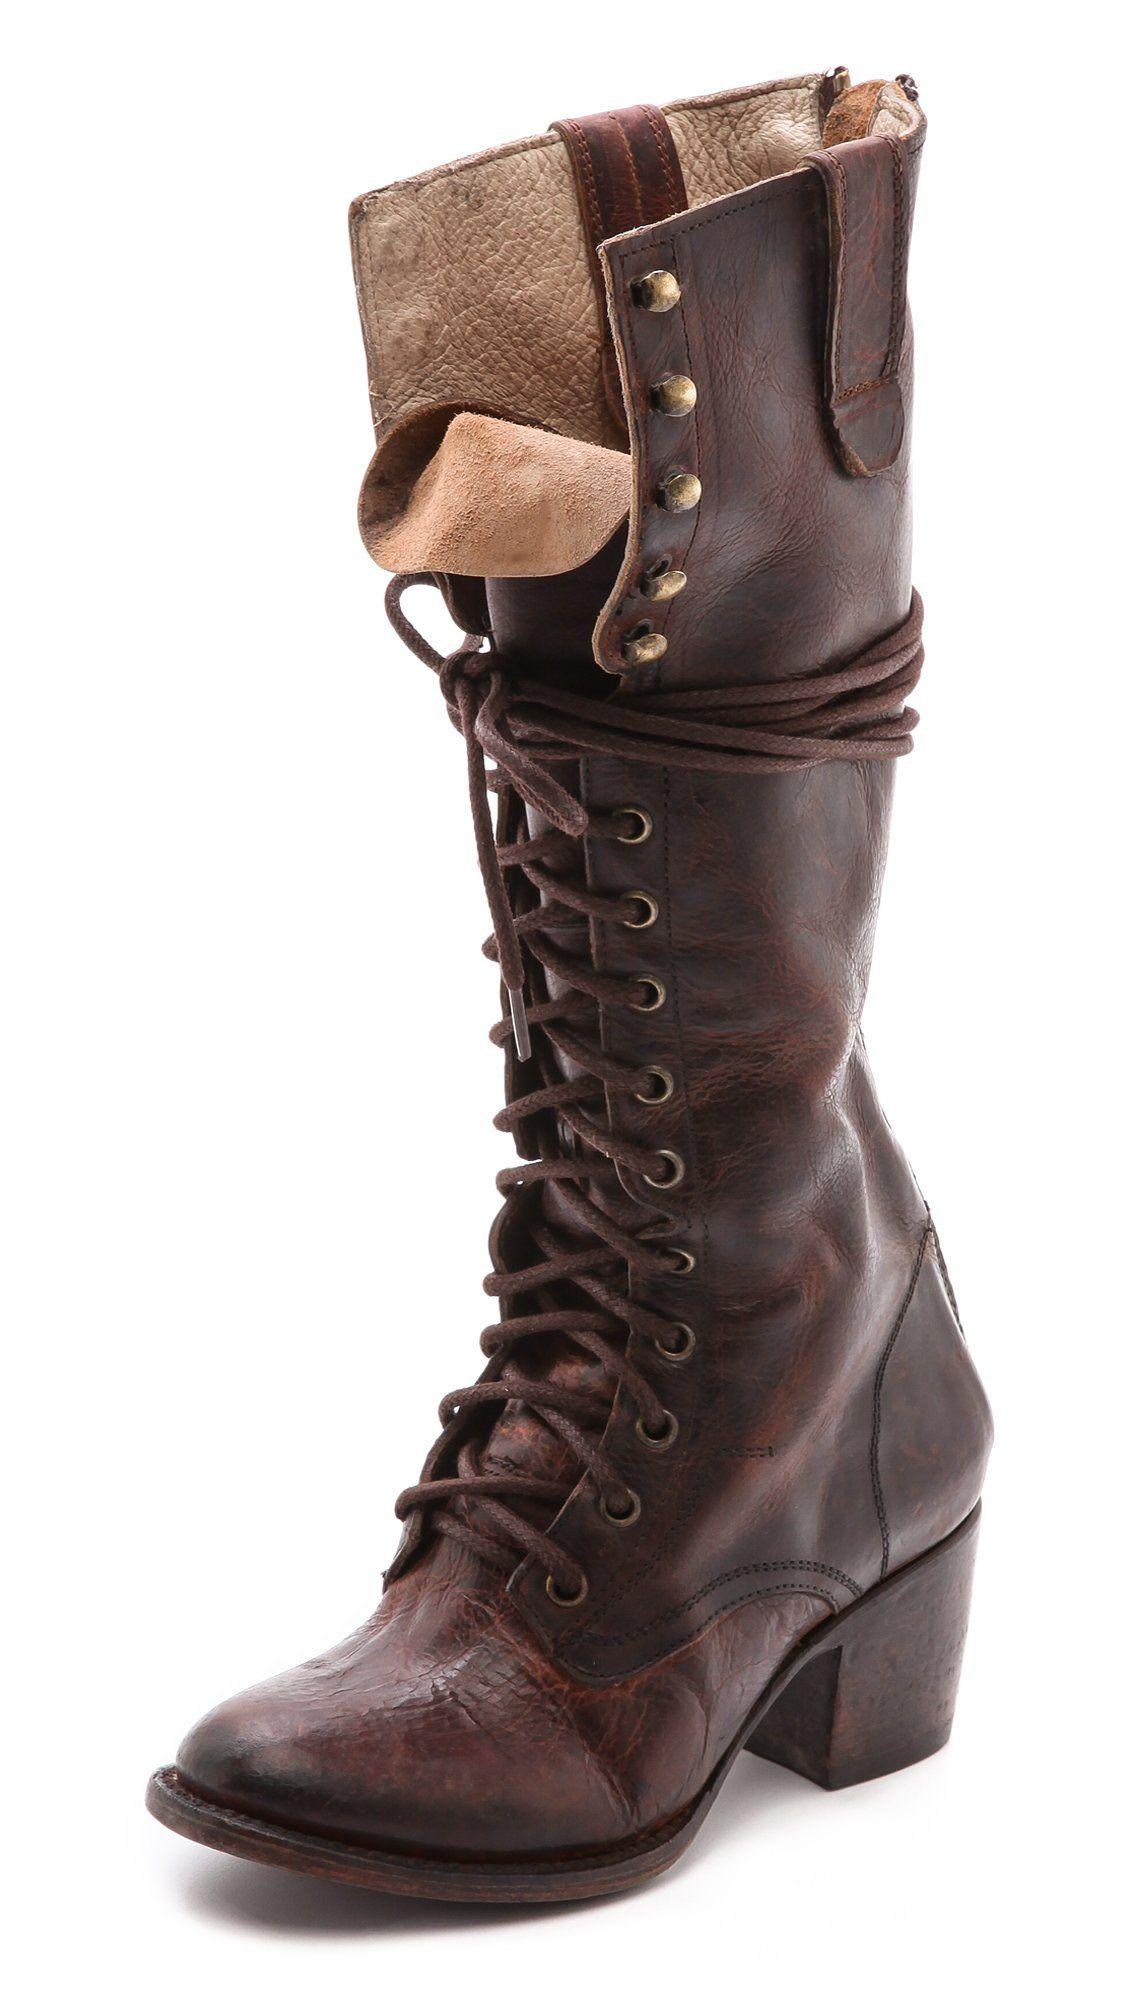 FREEBIRD by Steven Women s Granny Tall Combat Boots fb493a8049